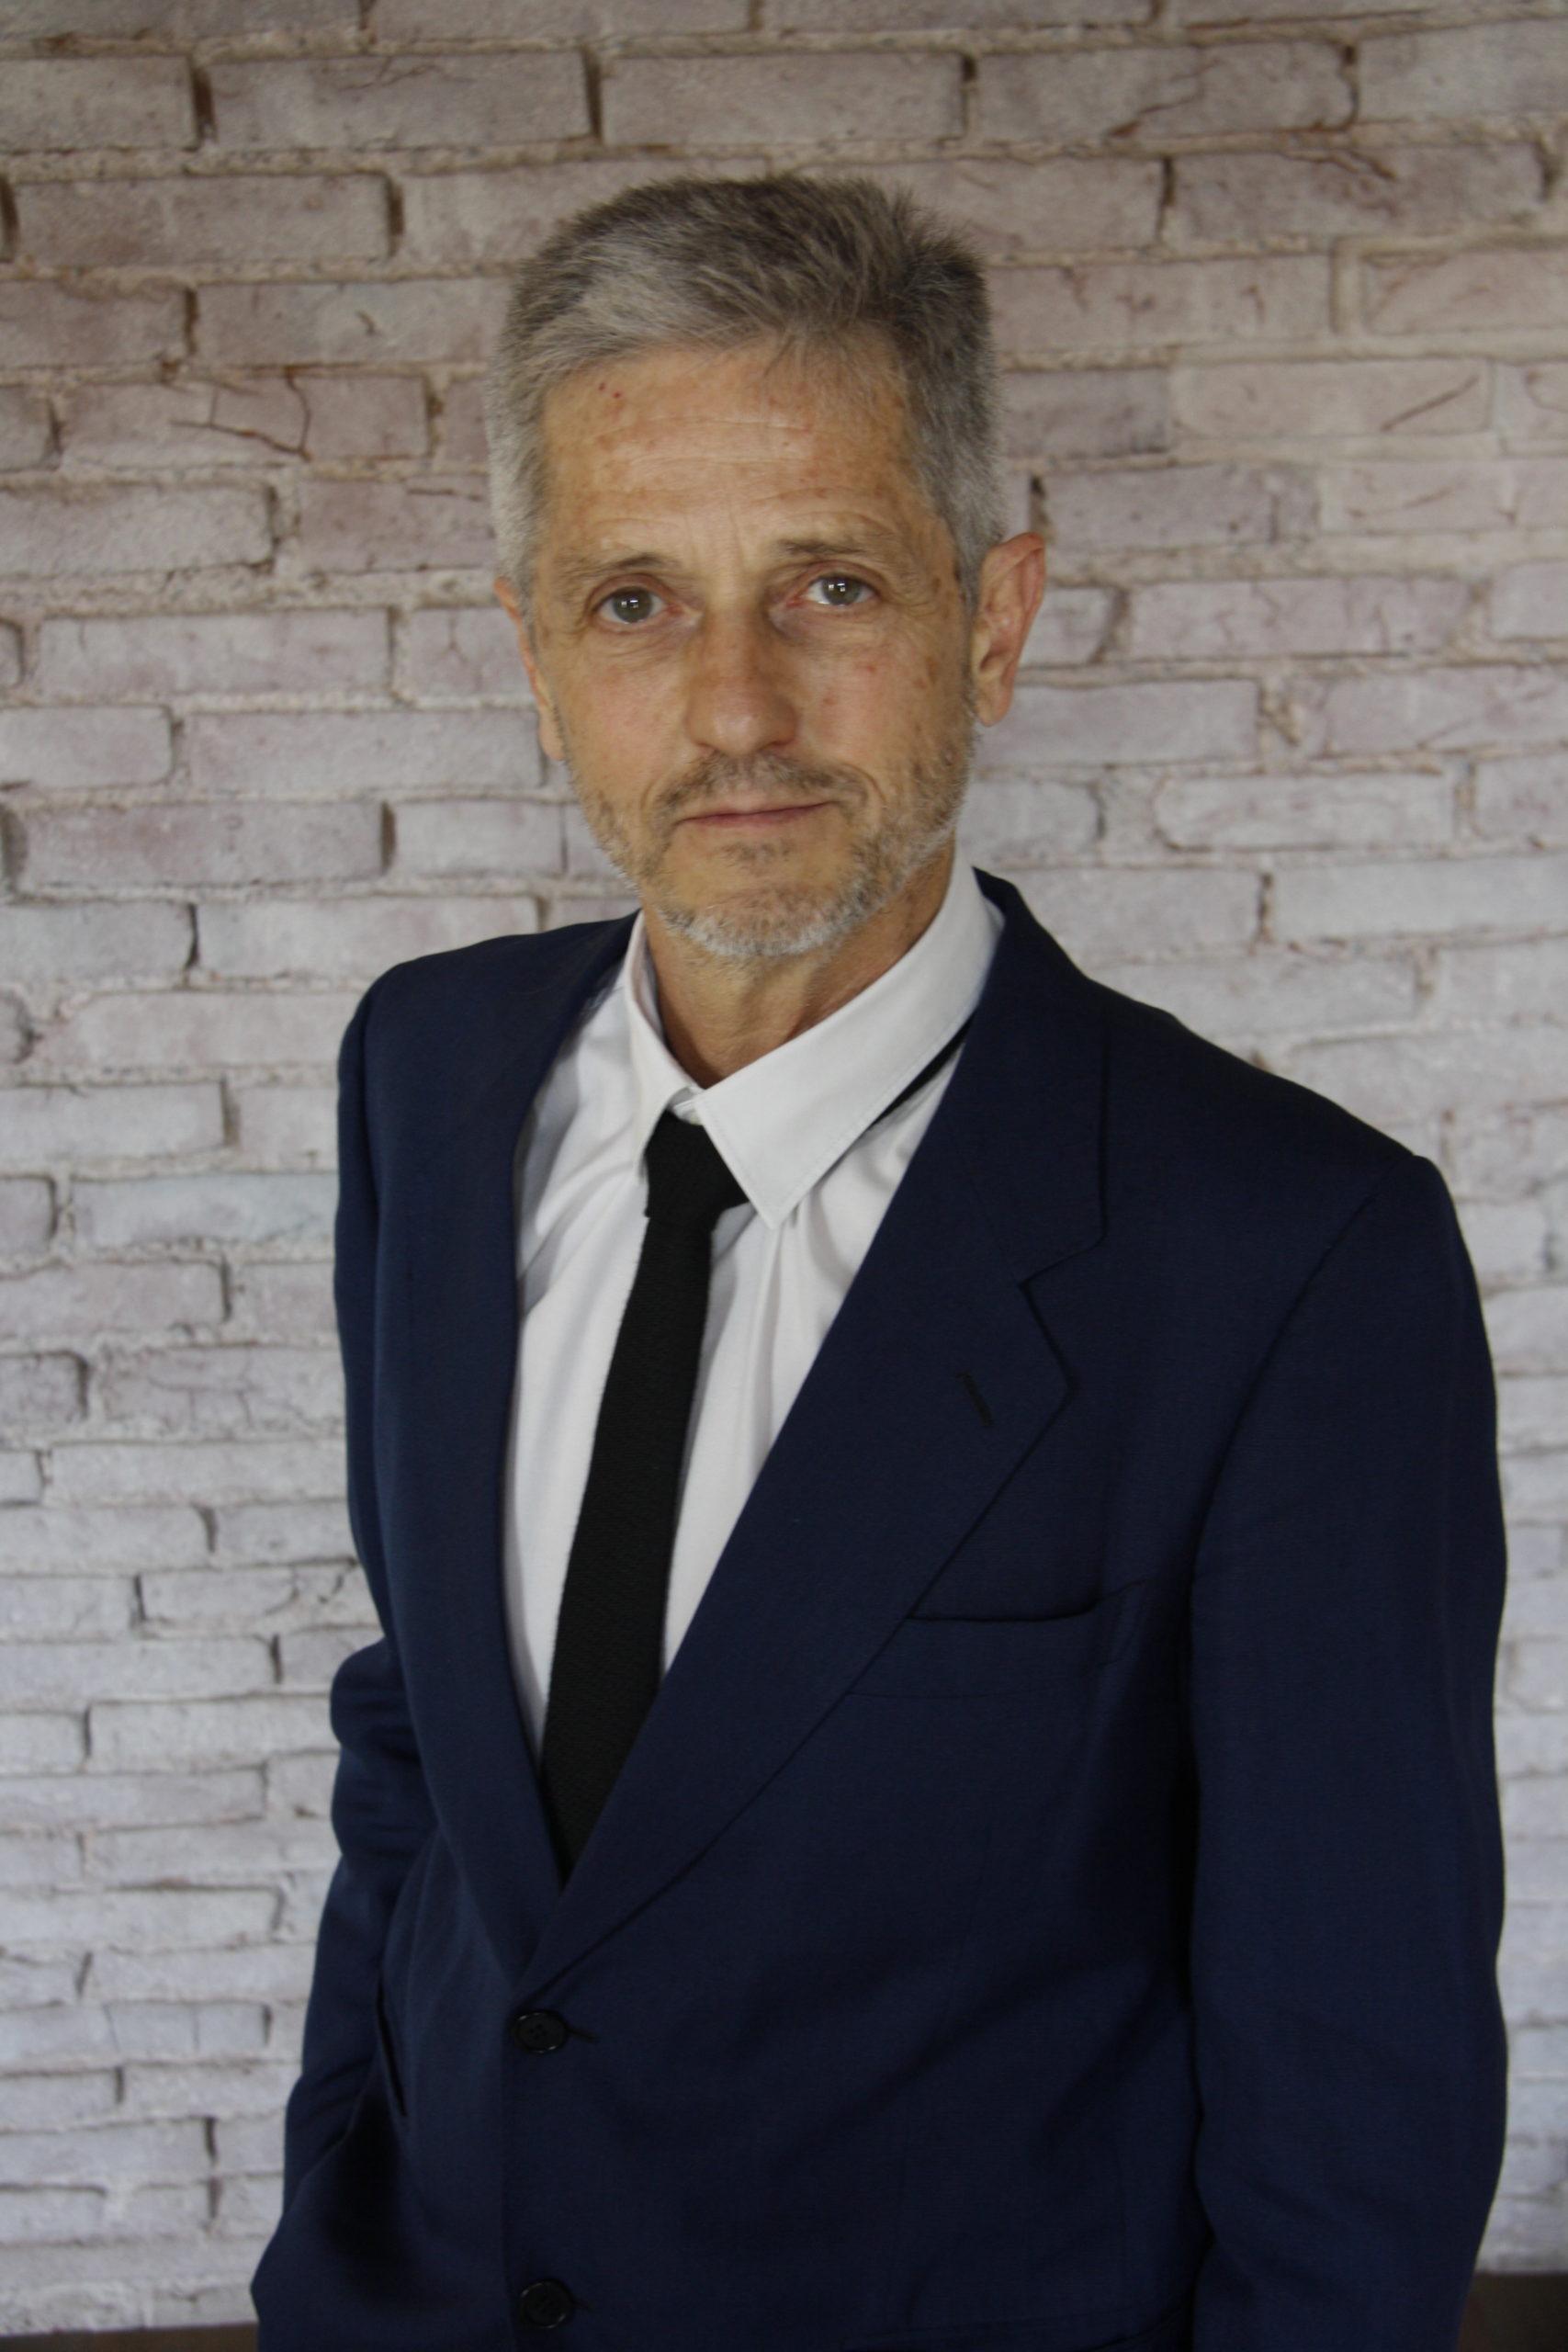 Sandro Billi, Side Note scc, Firenze, Italy